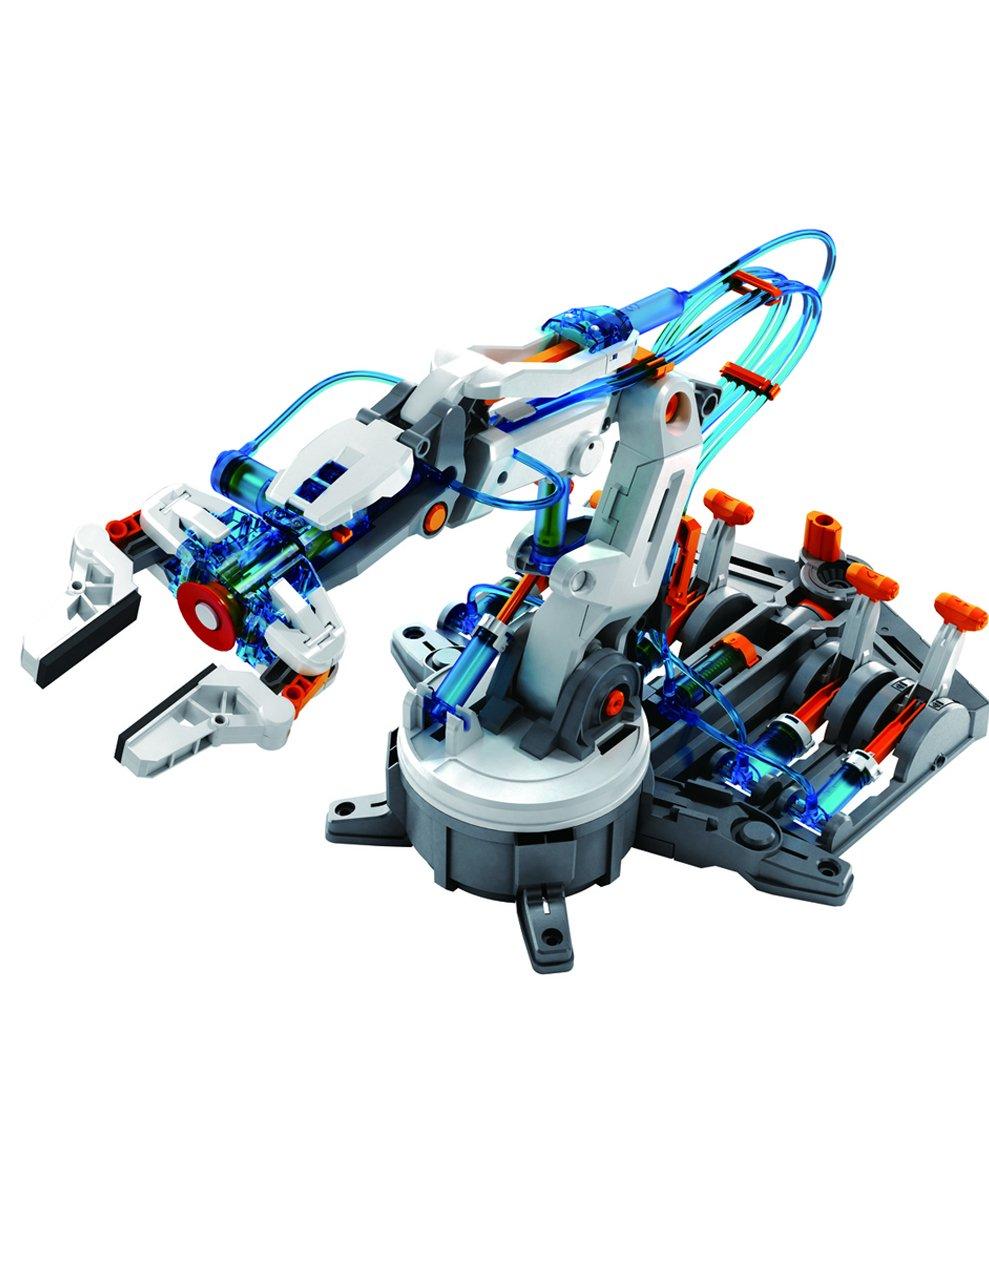 Amazon.com: CIRCUIT-TEST Hydraulic Robotic Arm Kit - Learn Hydro ...